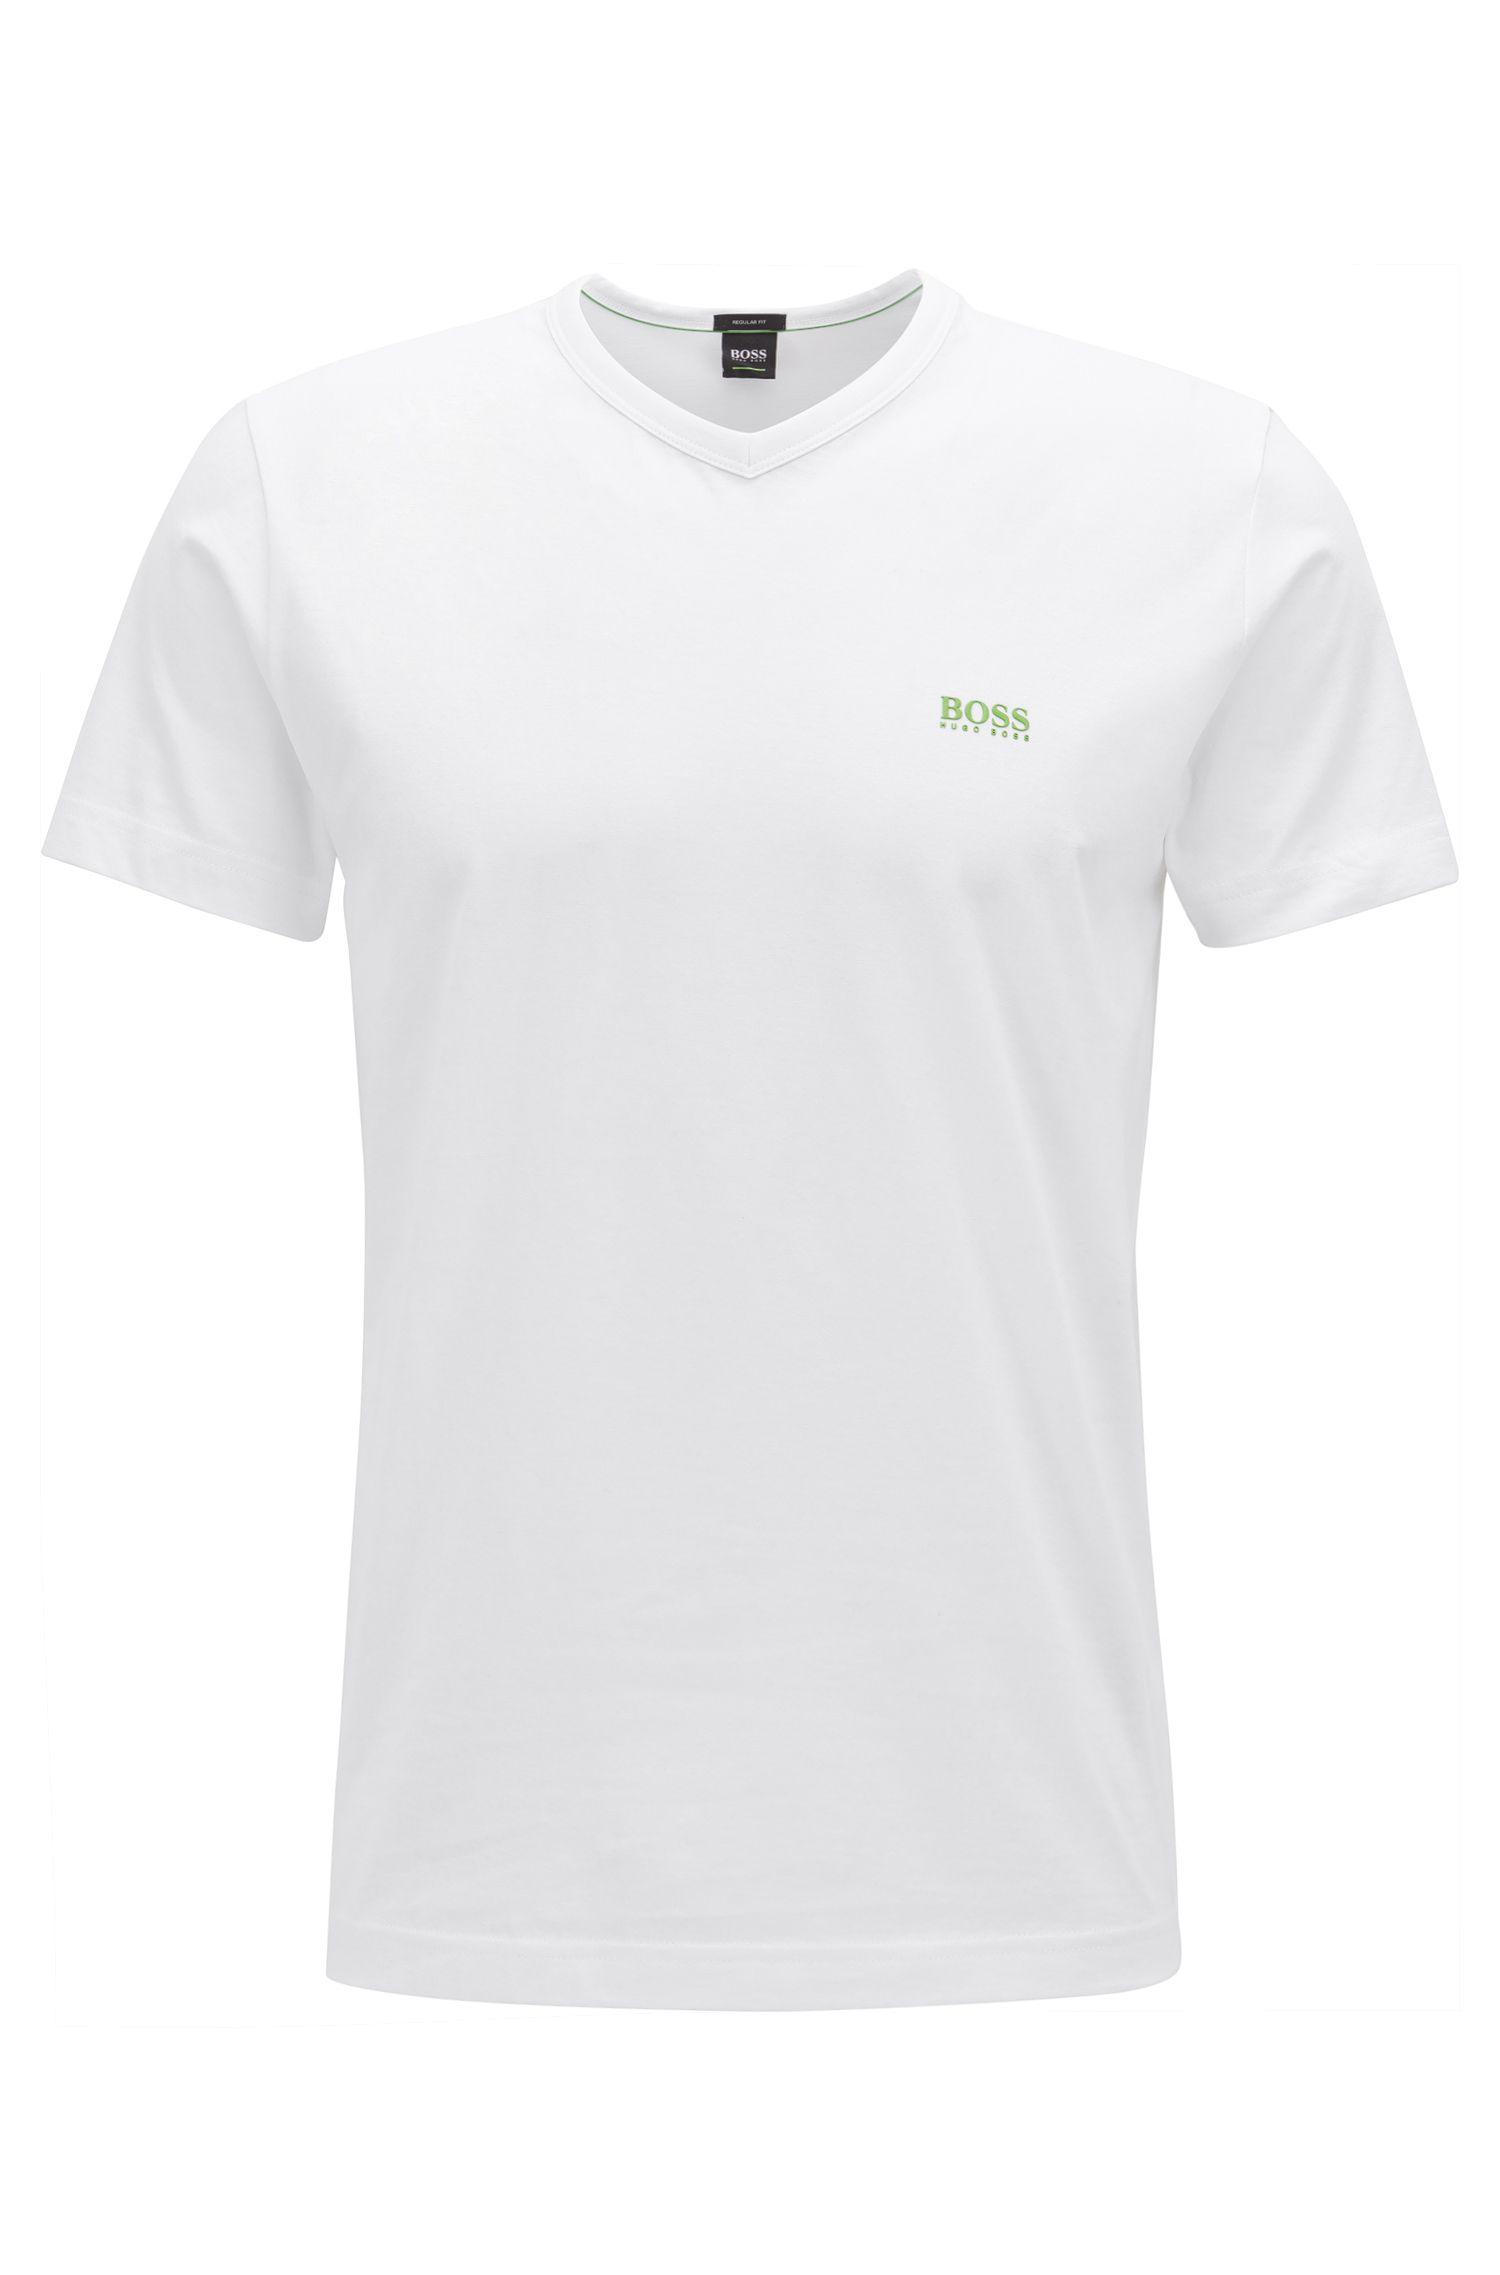 Cotton V-Neck T-Shirt | Teevn